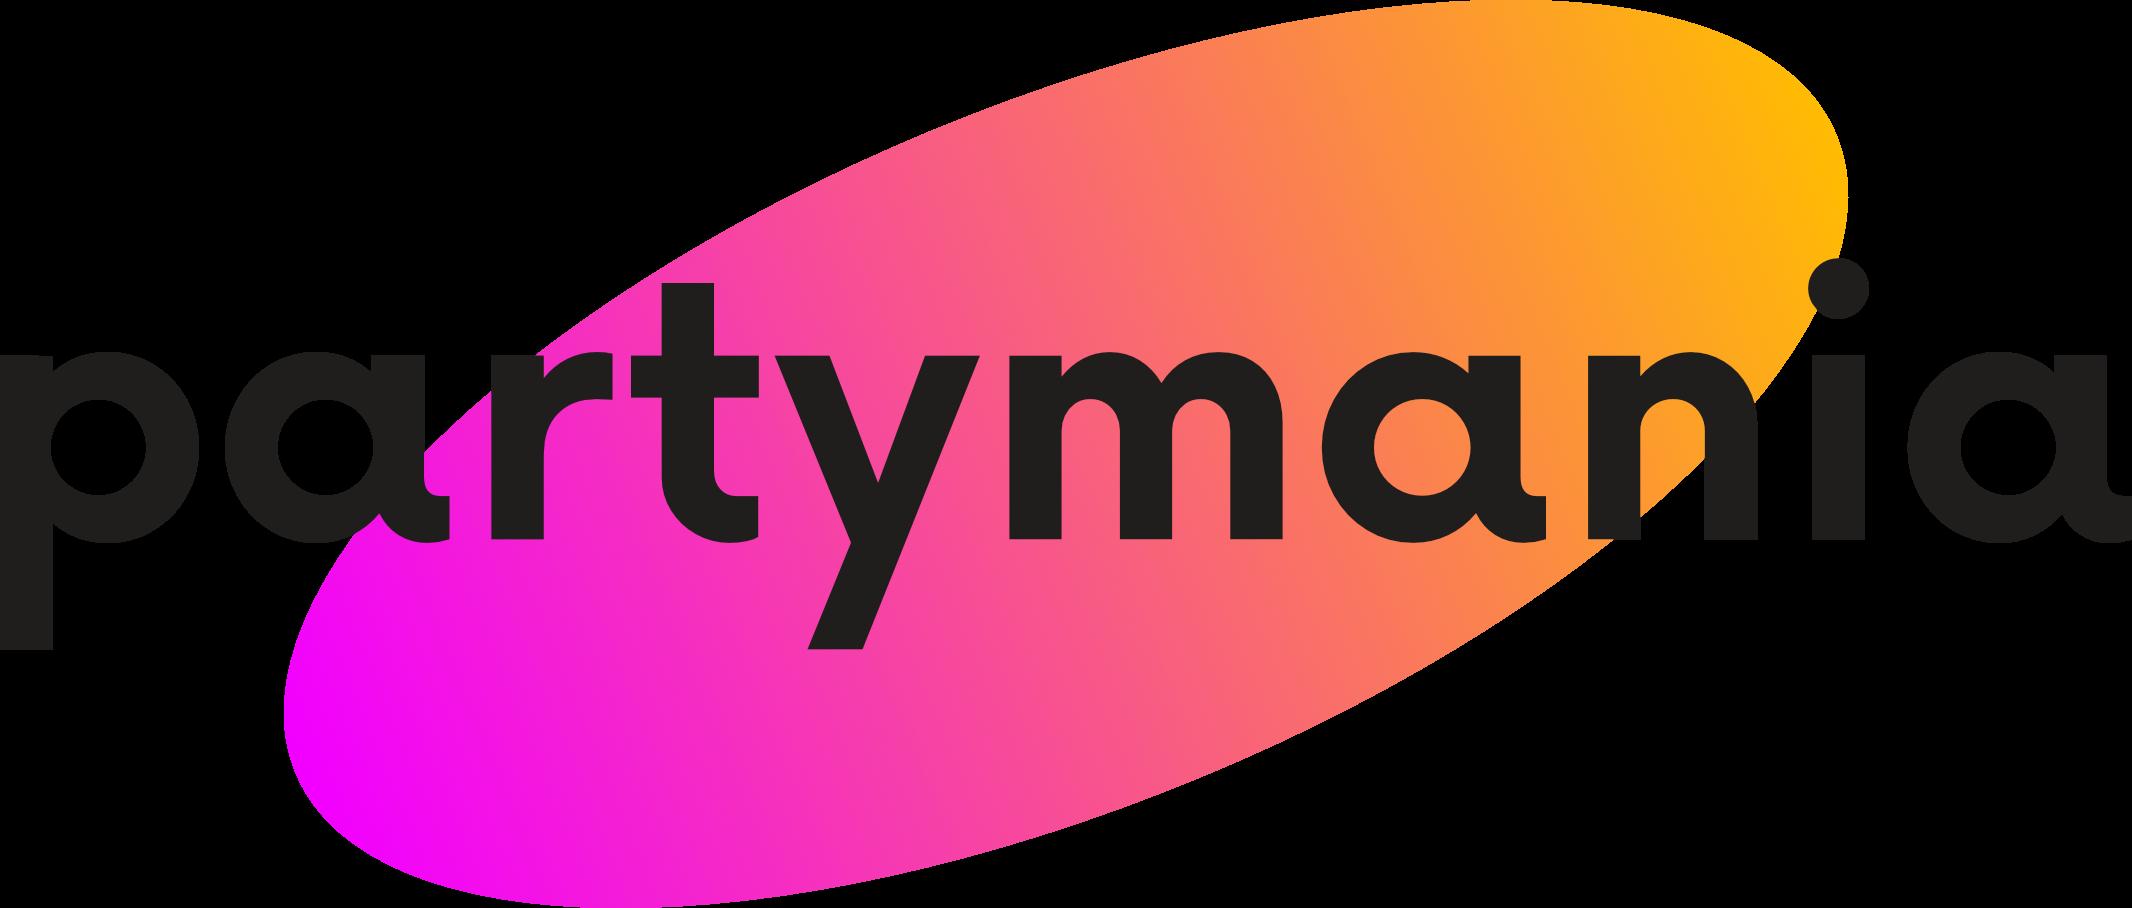 PARTYMANIA TV Online